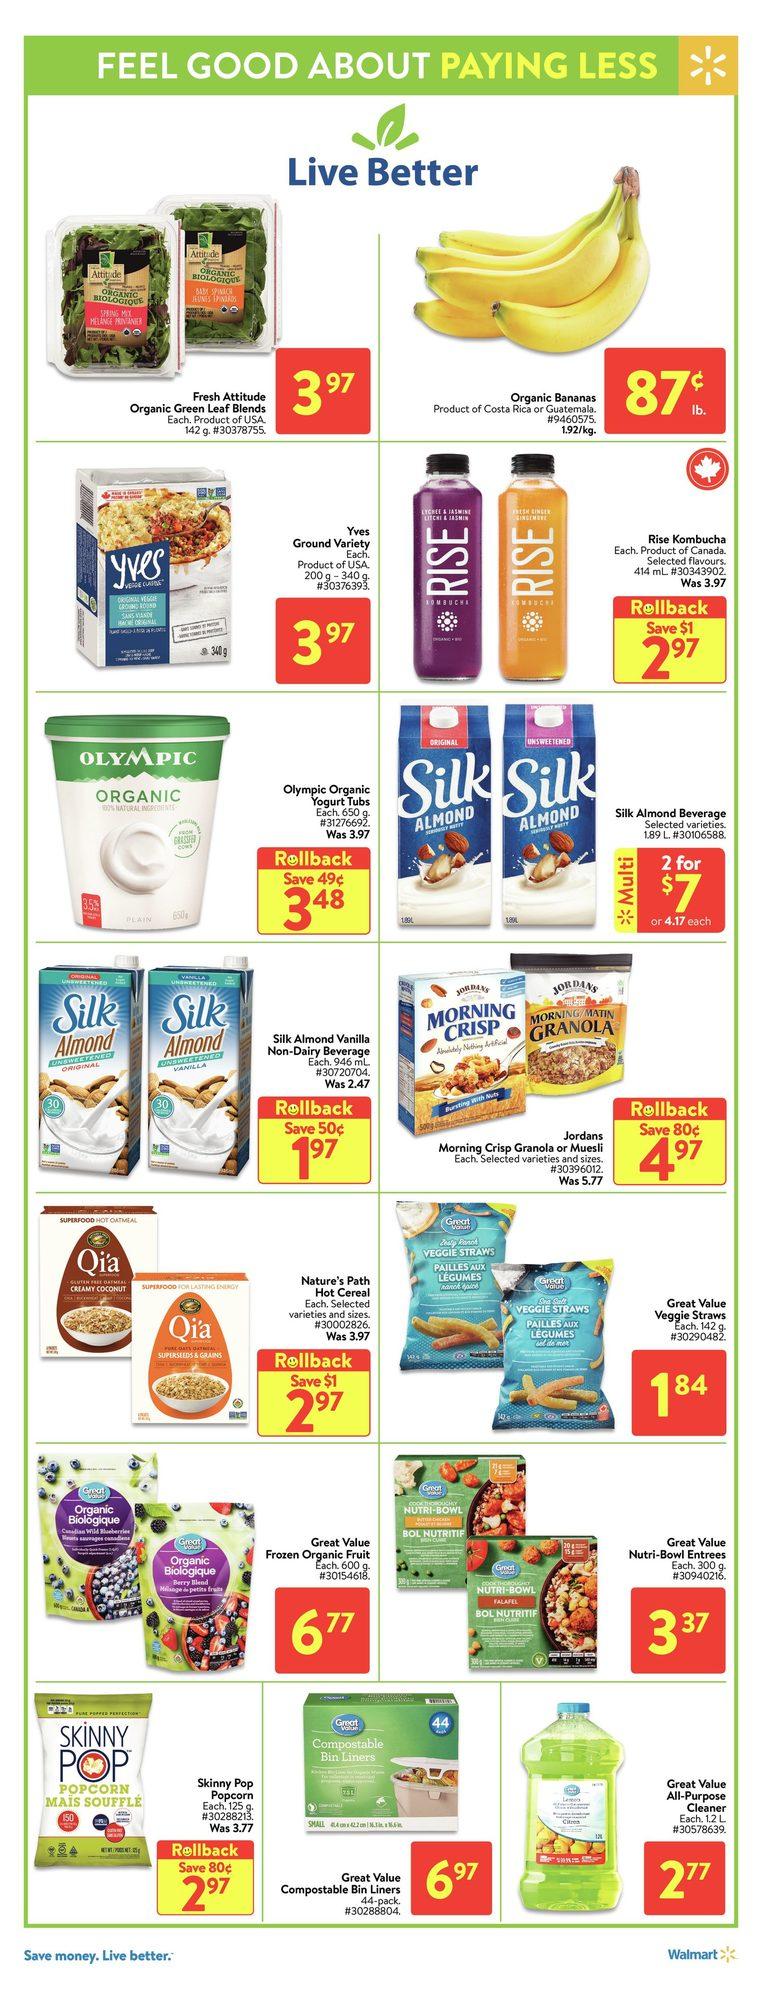 Walmart - Weekly Flyer Specials - Page 5